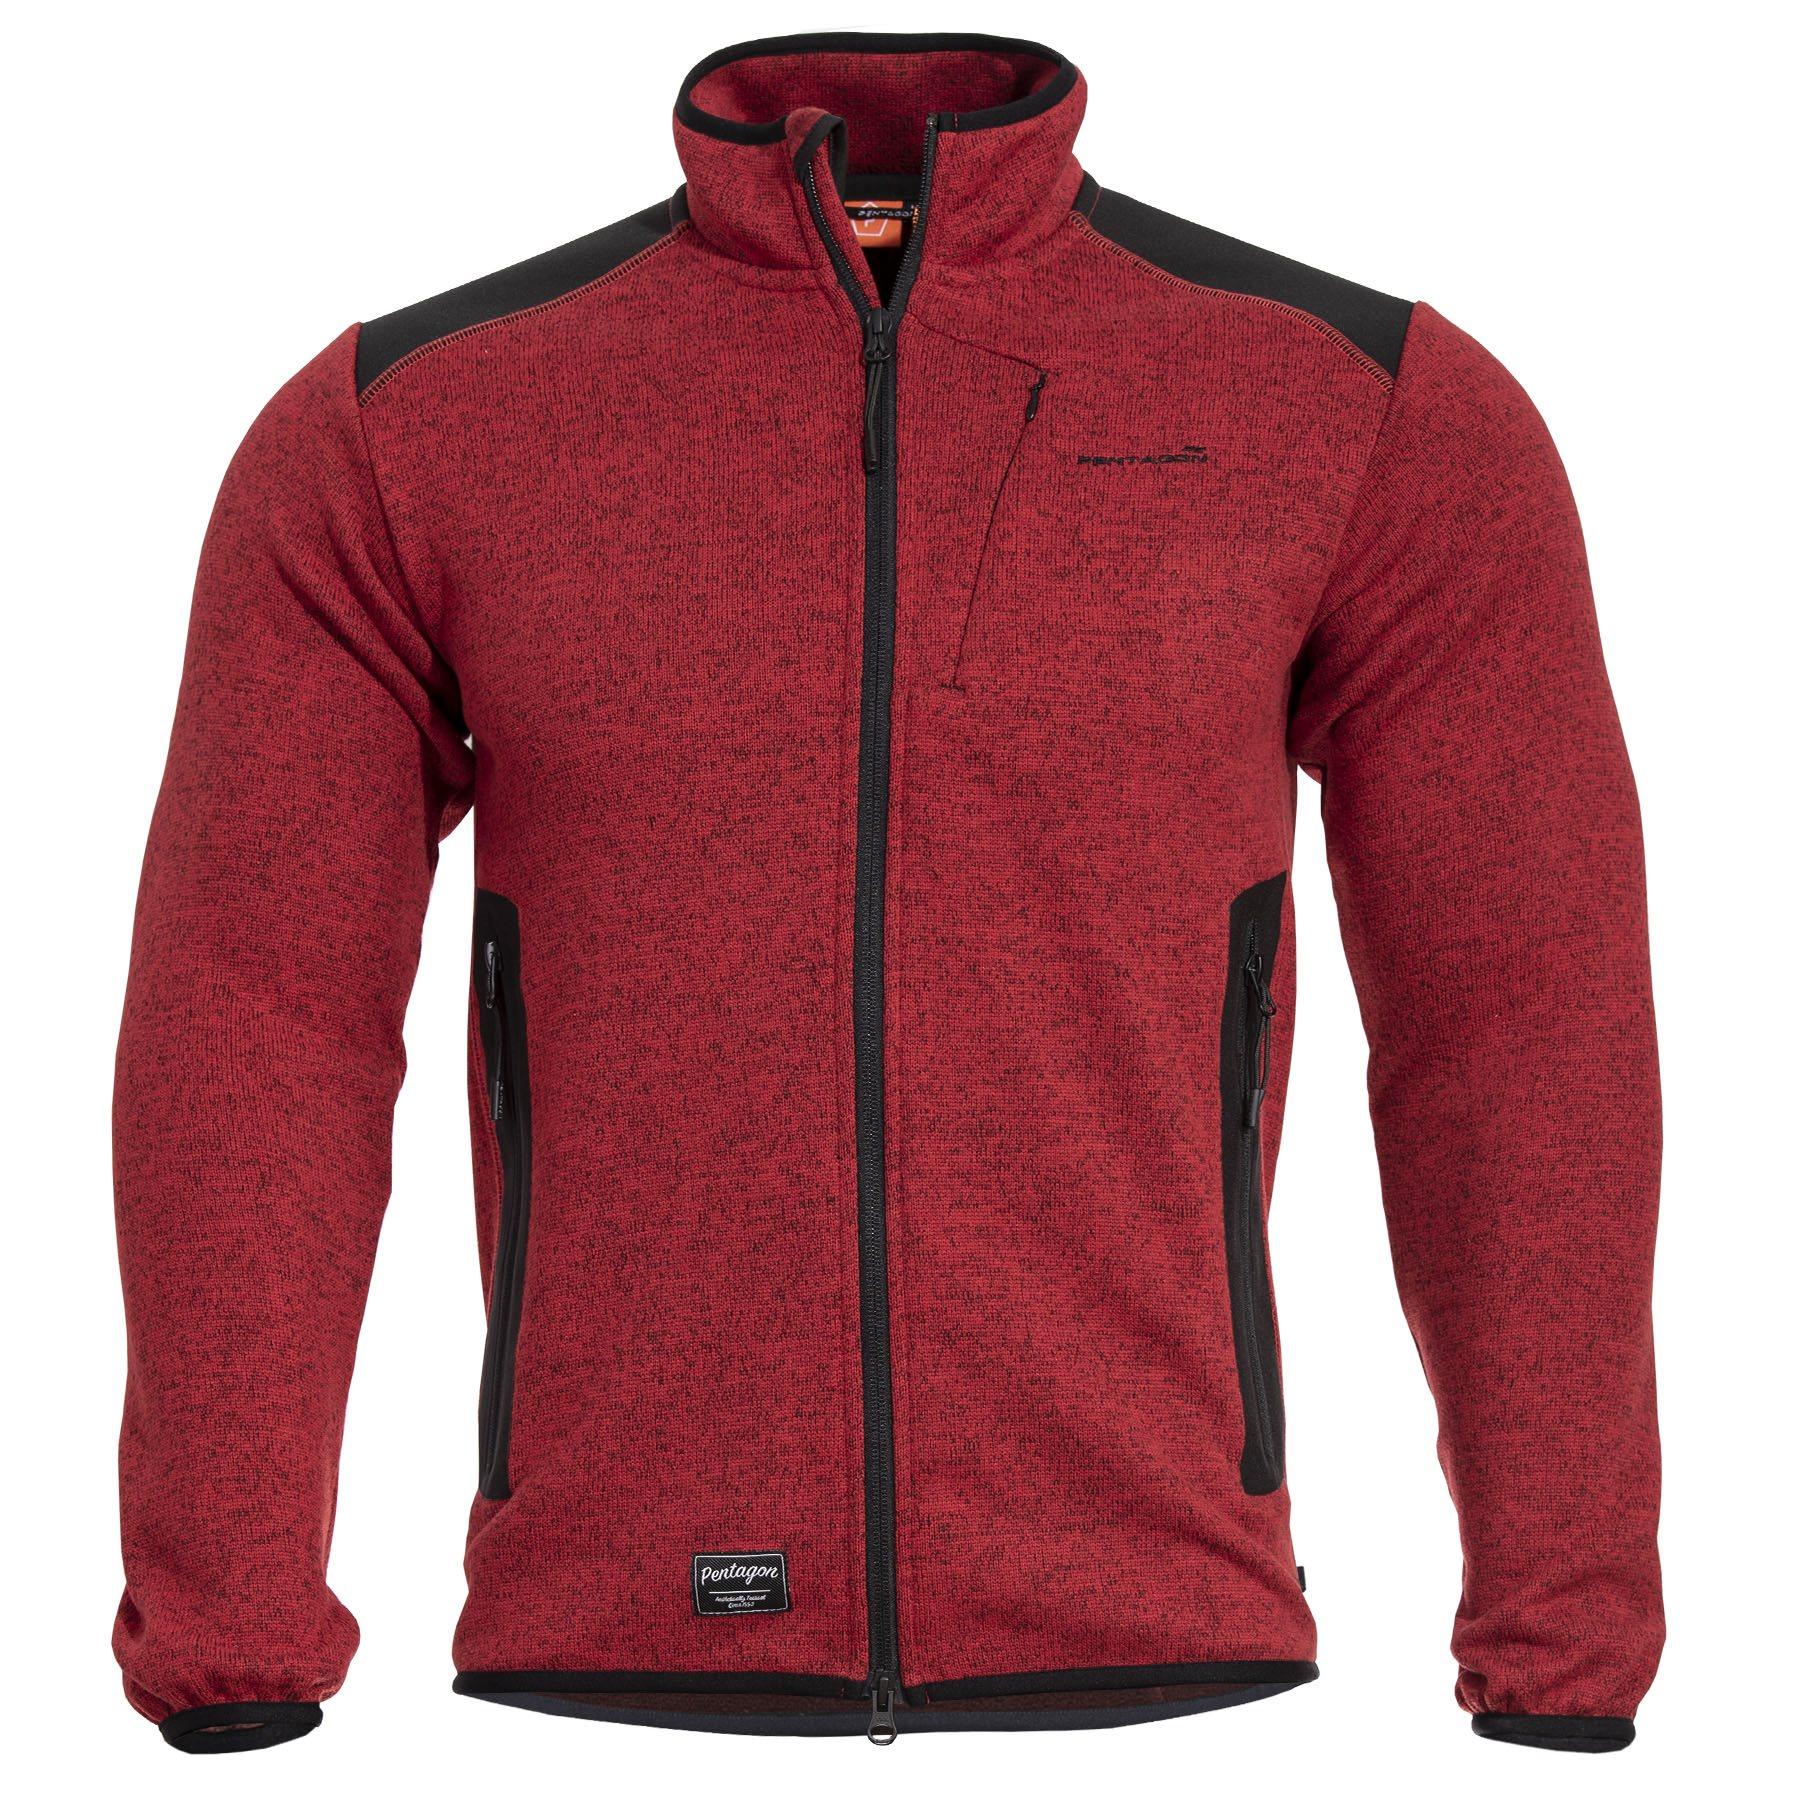 AMINTOR Fleece Sweater RED PENTAGON K08028-07 L-11